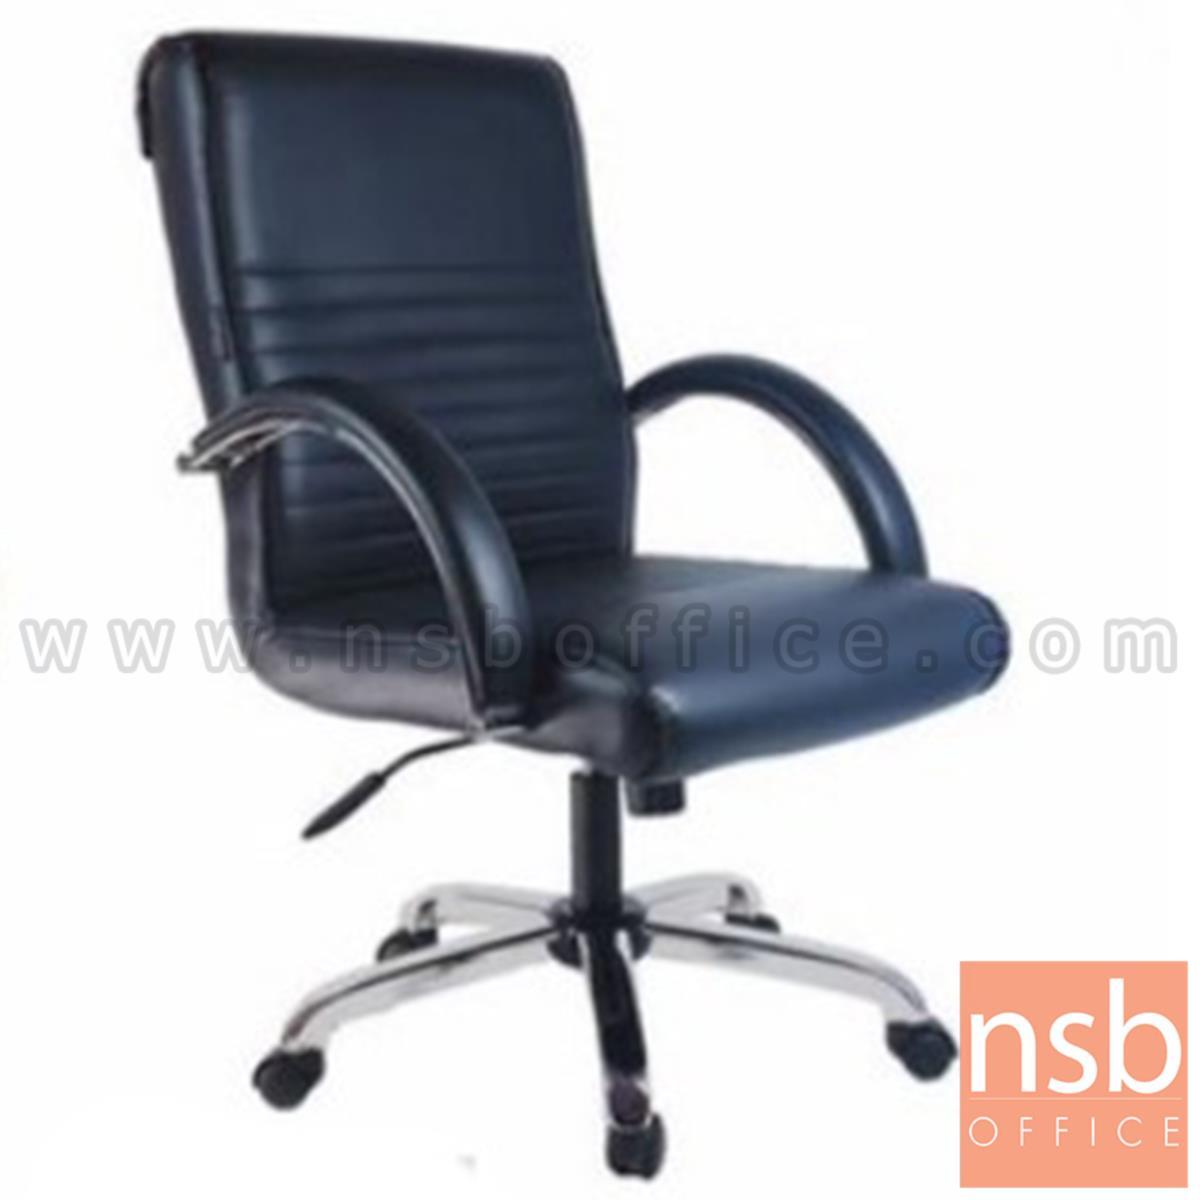 B03A508:เก้าอี้สำนักงาน รุ่น Calissa (คาลิสสา)  โช๊คแก๊ส ก้อนโยก ขาเหล็กชุบโครเมี่ยม